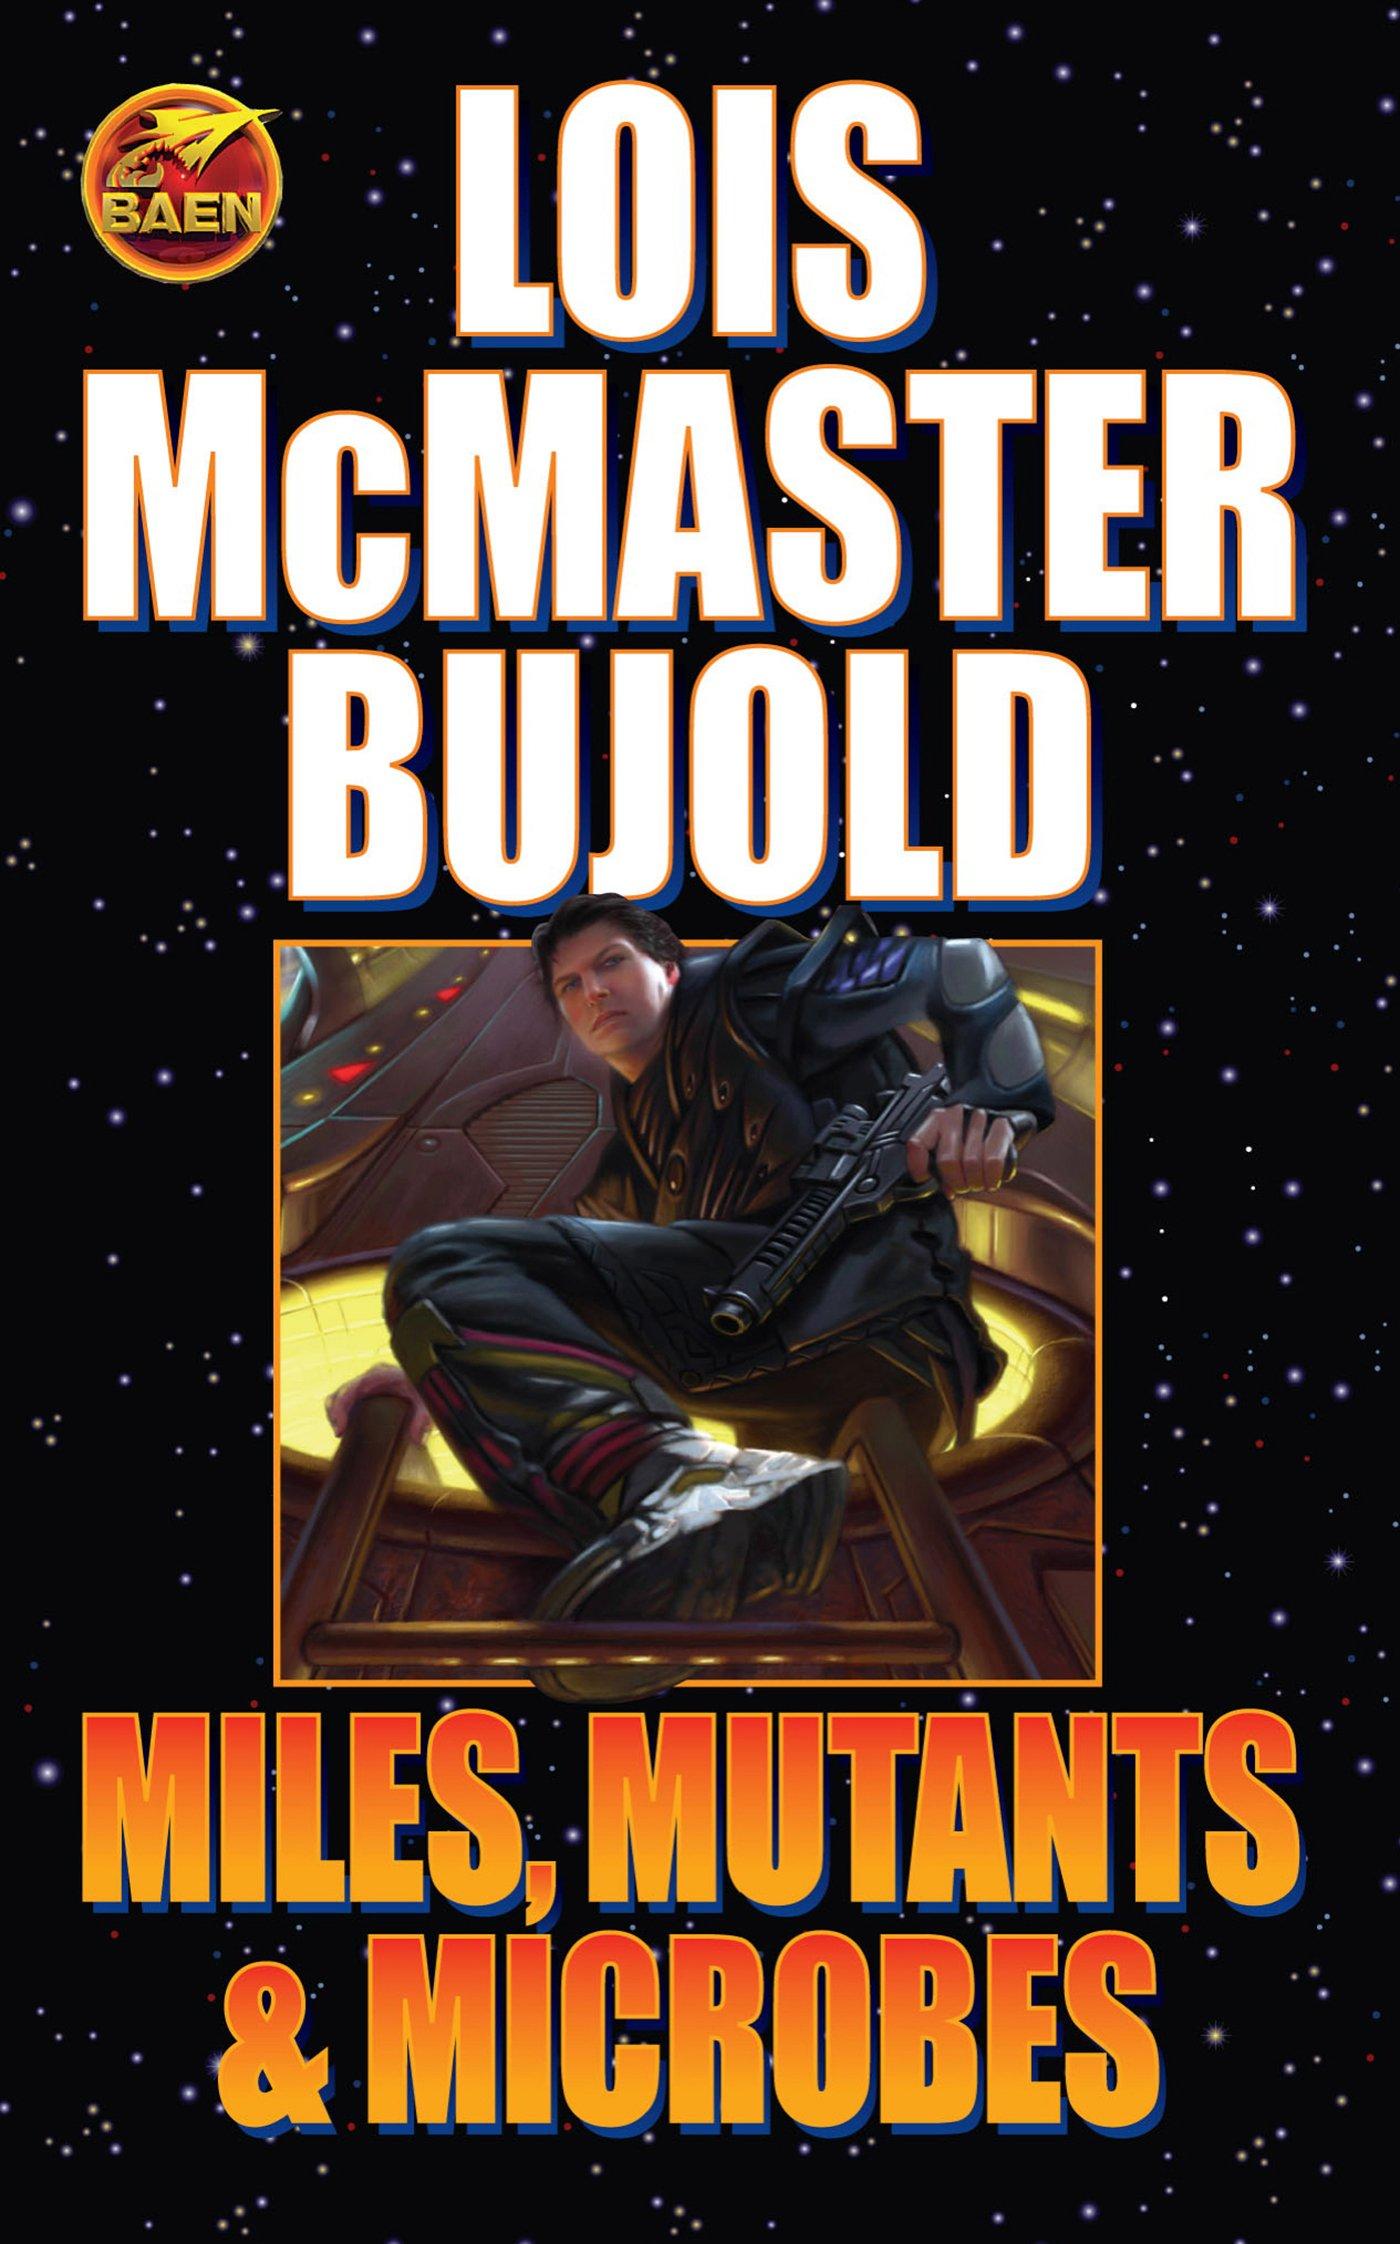 Miles Mutants & Microbes (Vorkosigan Saga): Amazon.co.uk: Lois McMaster  Bujold: 9781416556008: Books